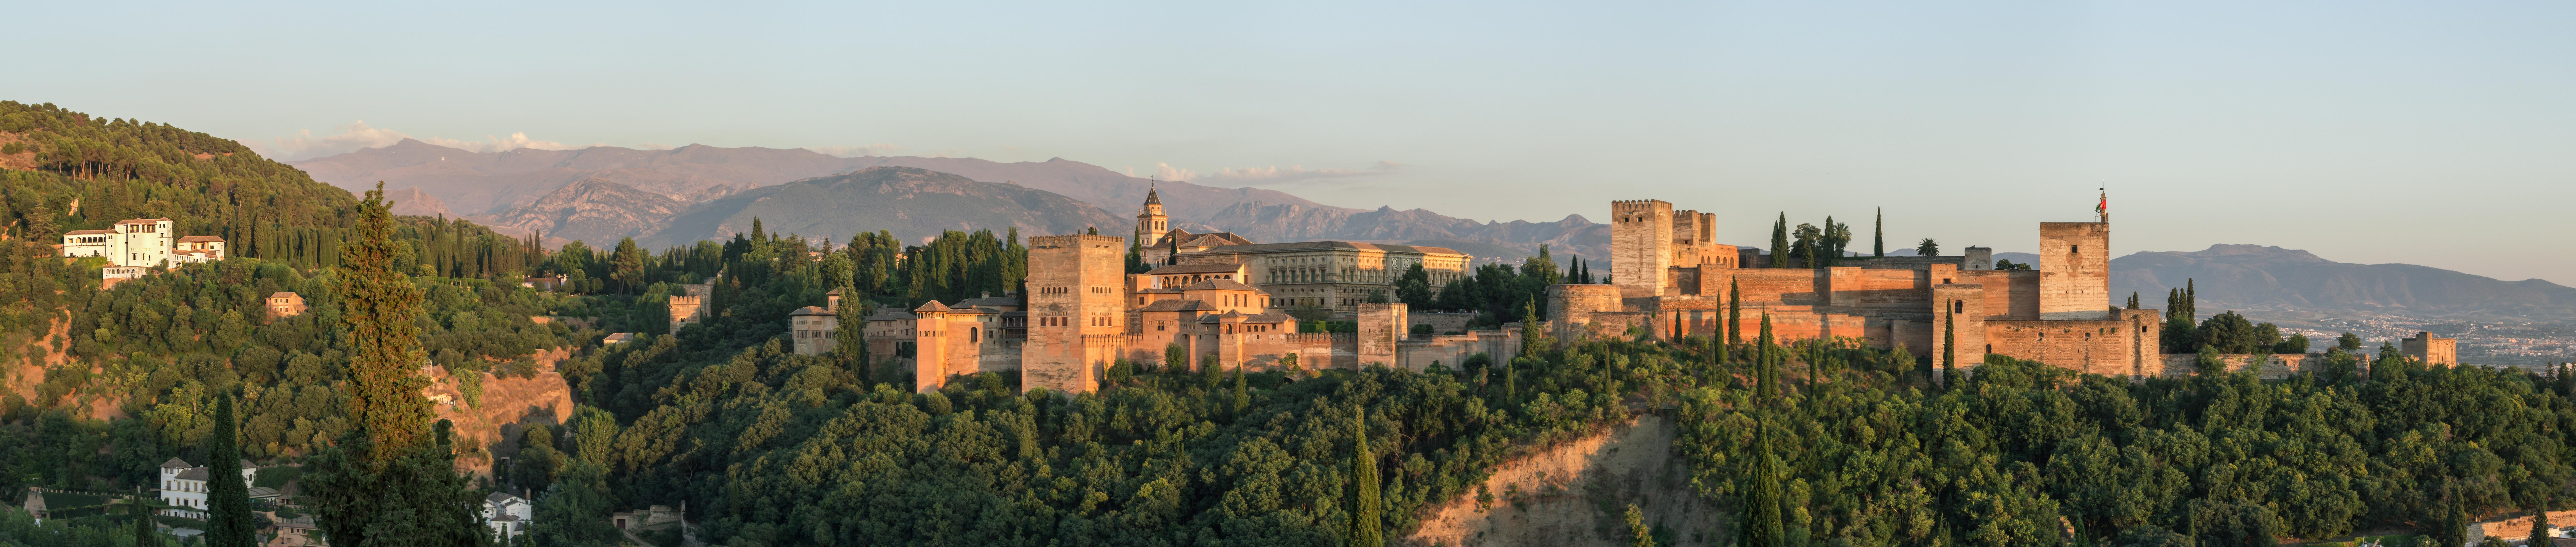 Blick auf die Alhambra in Granada. (Quelle: Slaunger via Wikimedia Commons unter Lizenz CC-BY-SA 3.0)